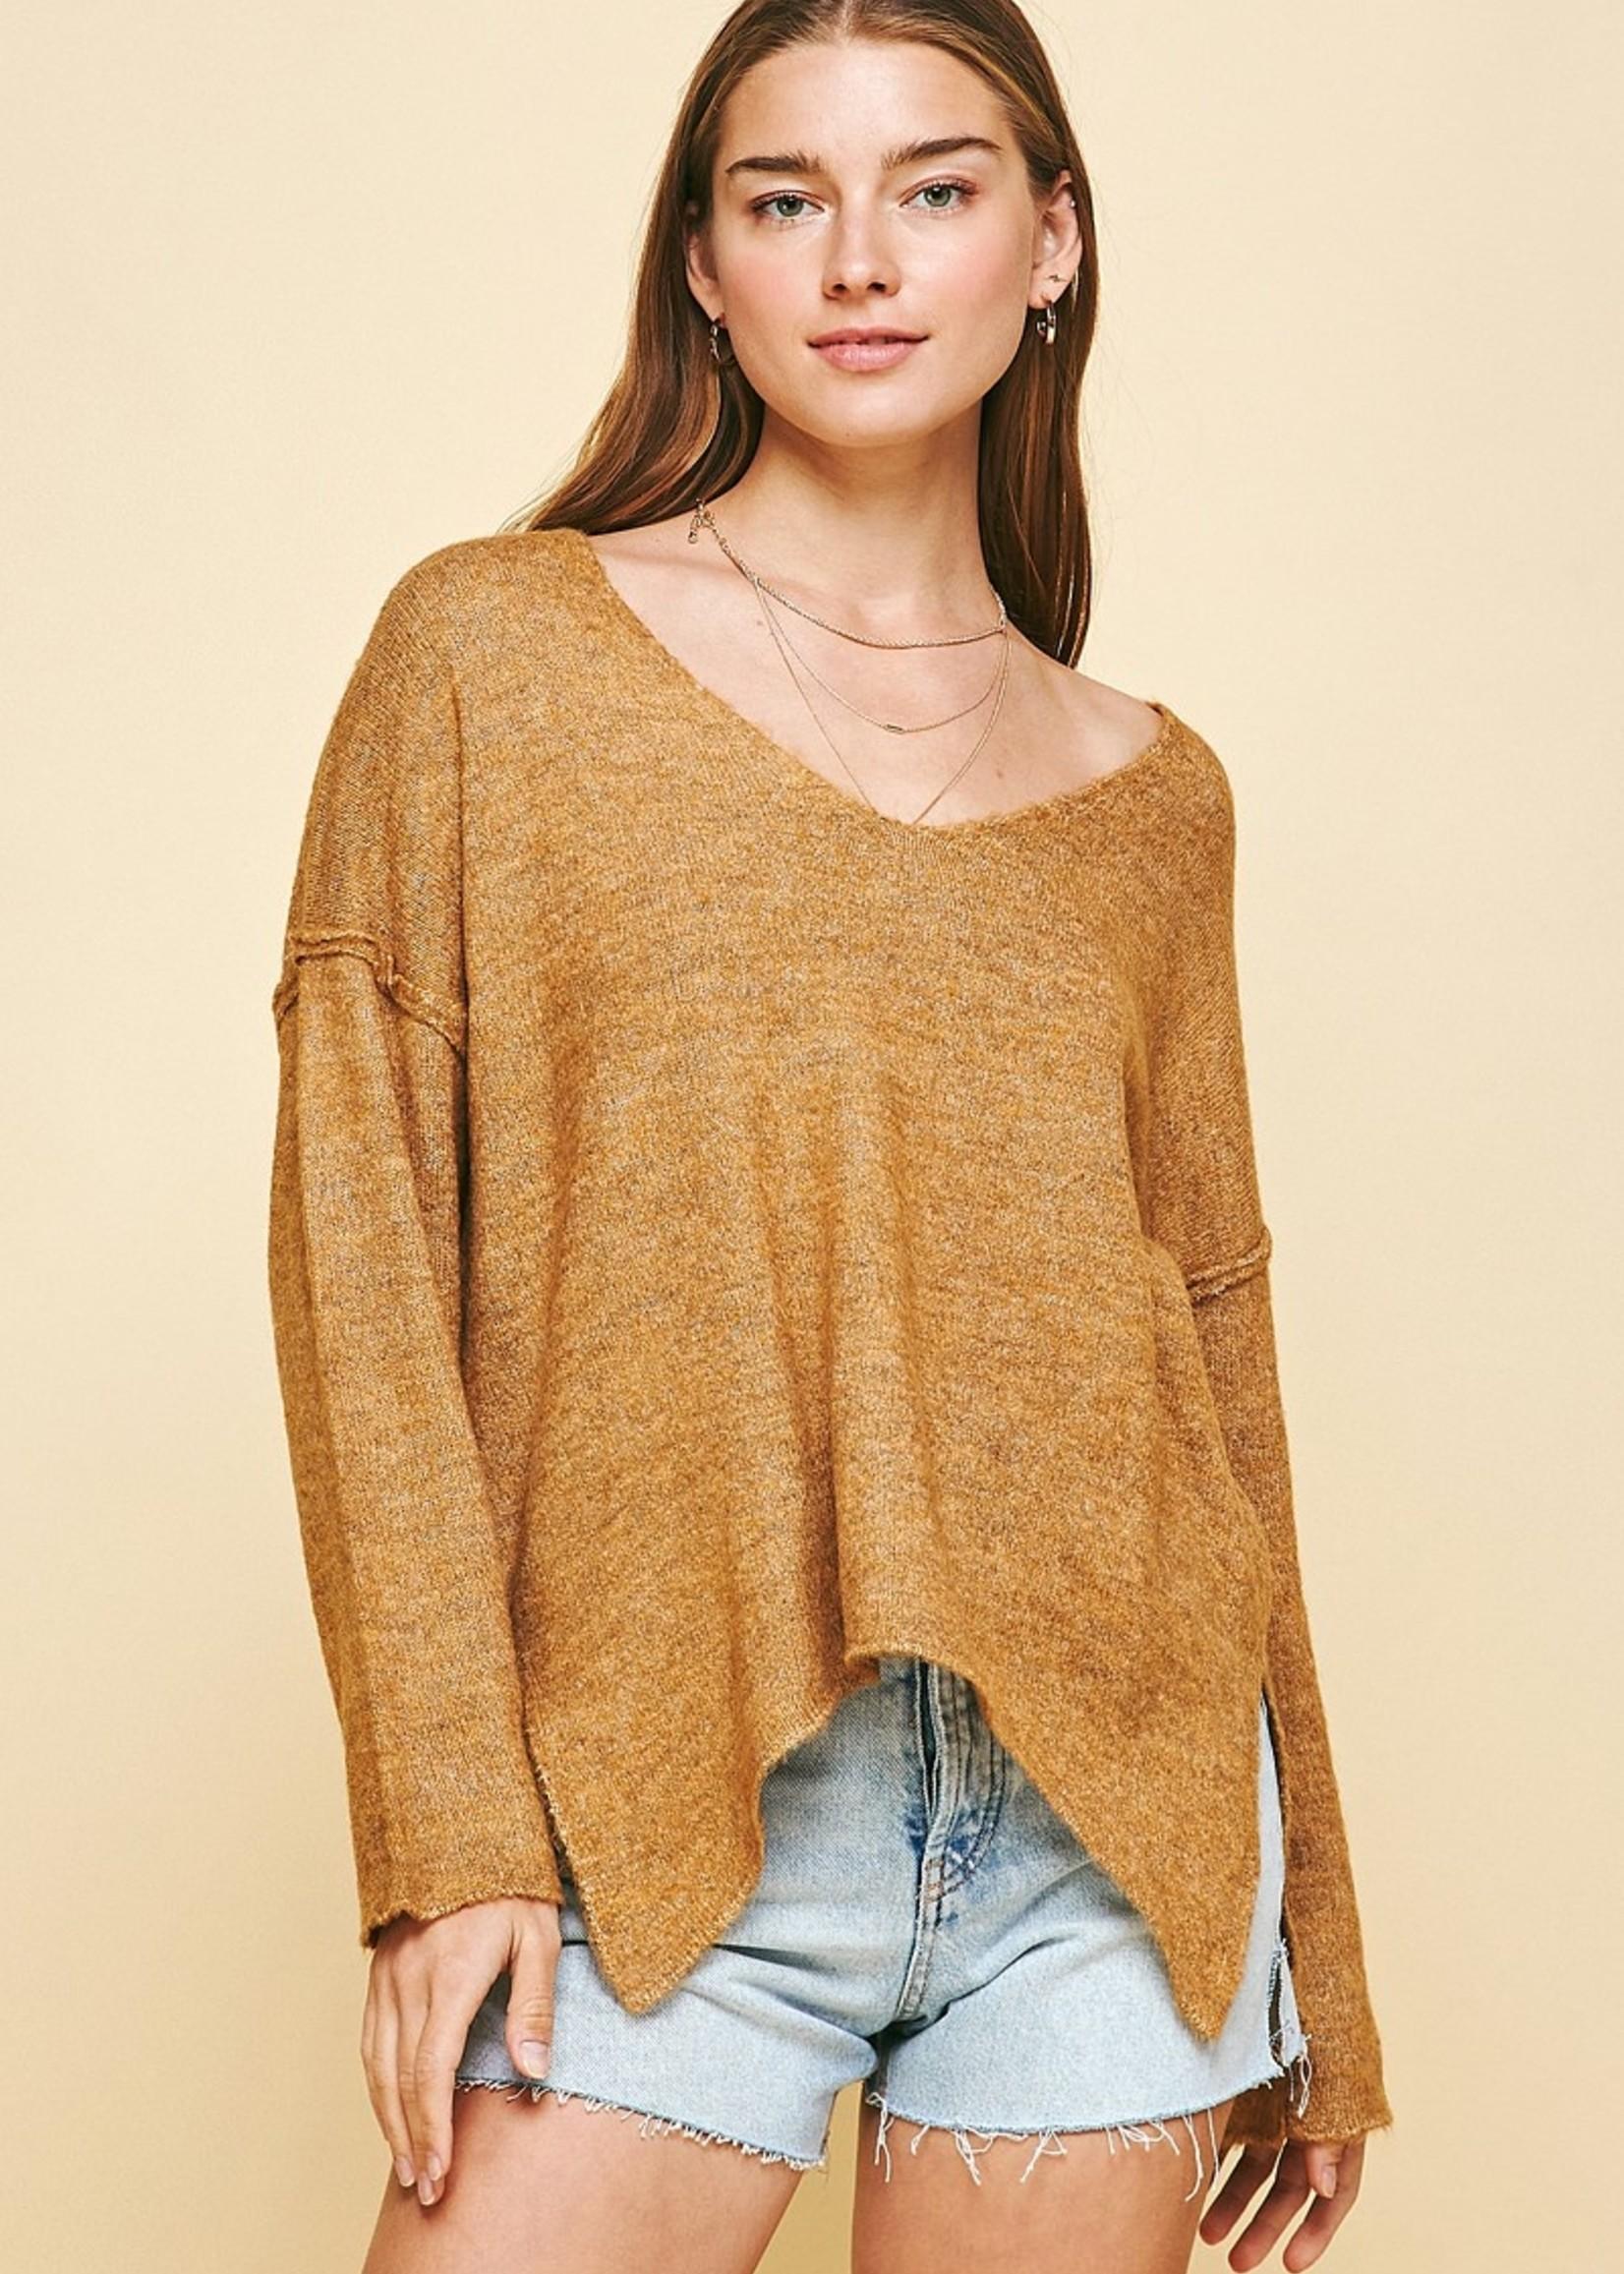 Soft V Neck Sweater - Mustard